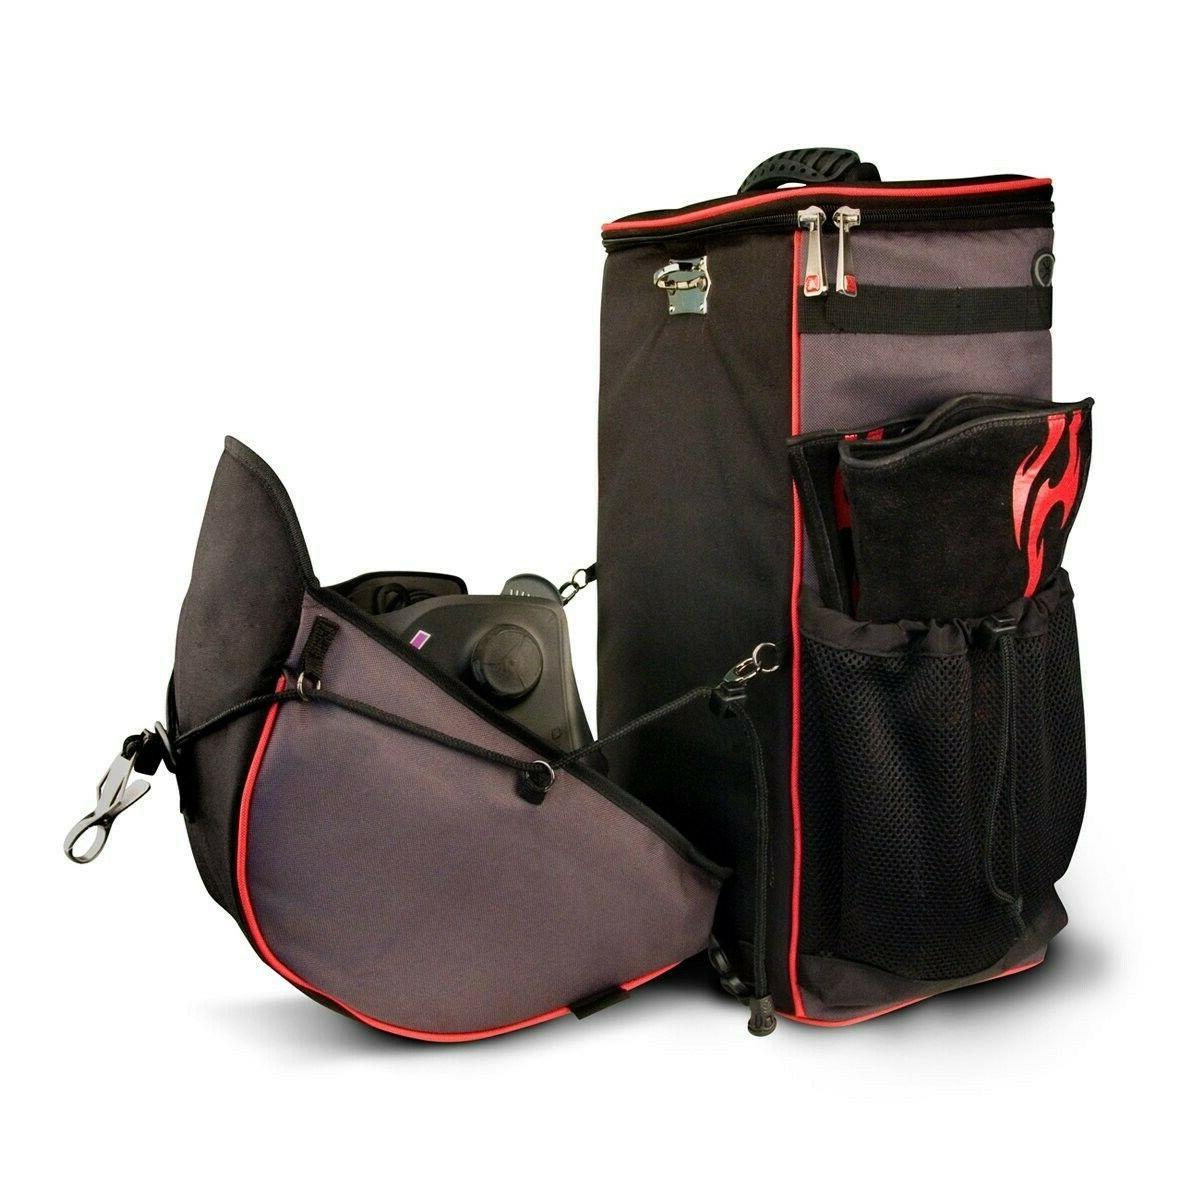 bsx welding backpack welder tool bag helmet